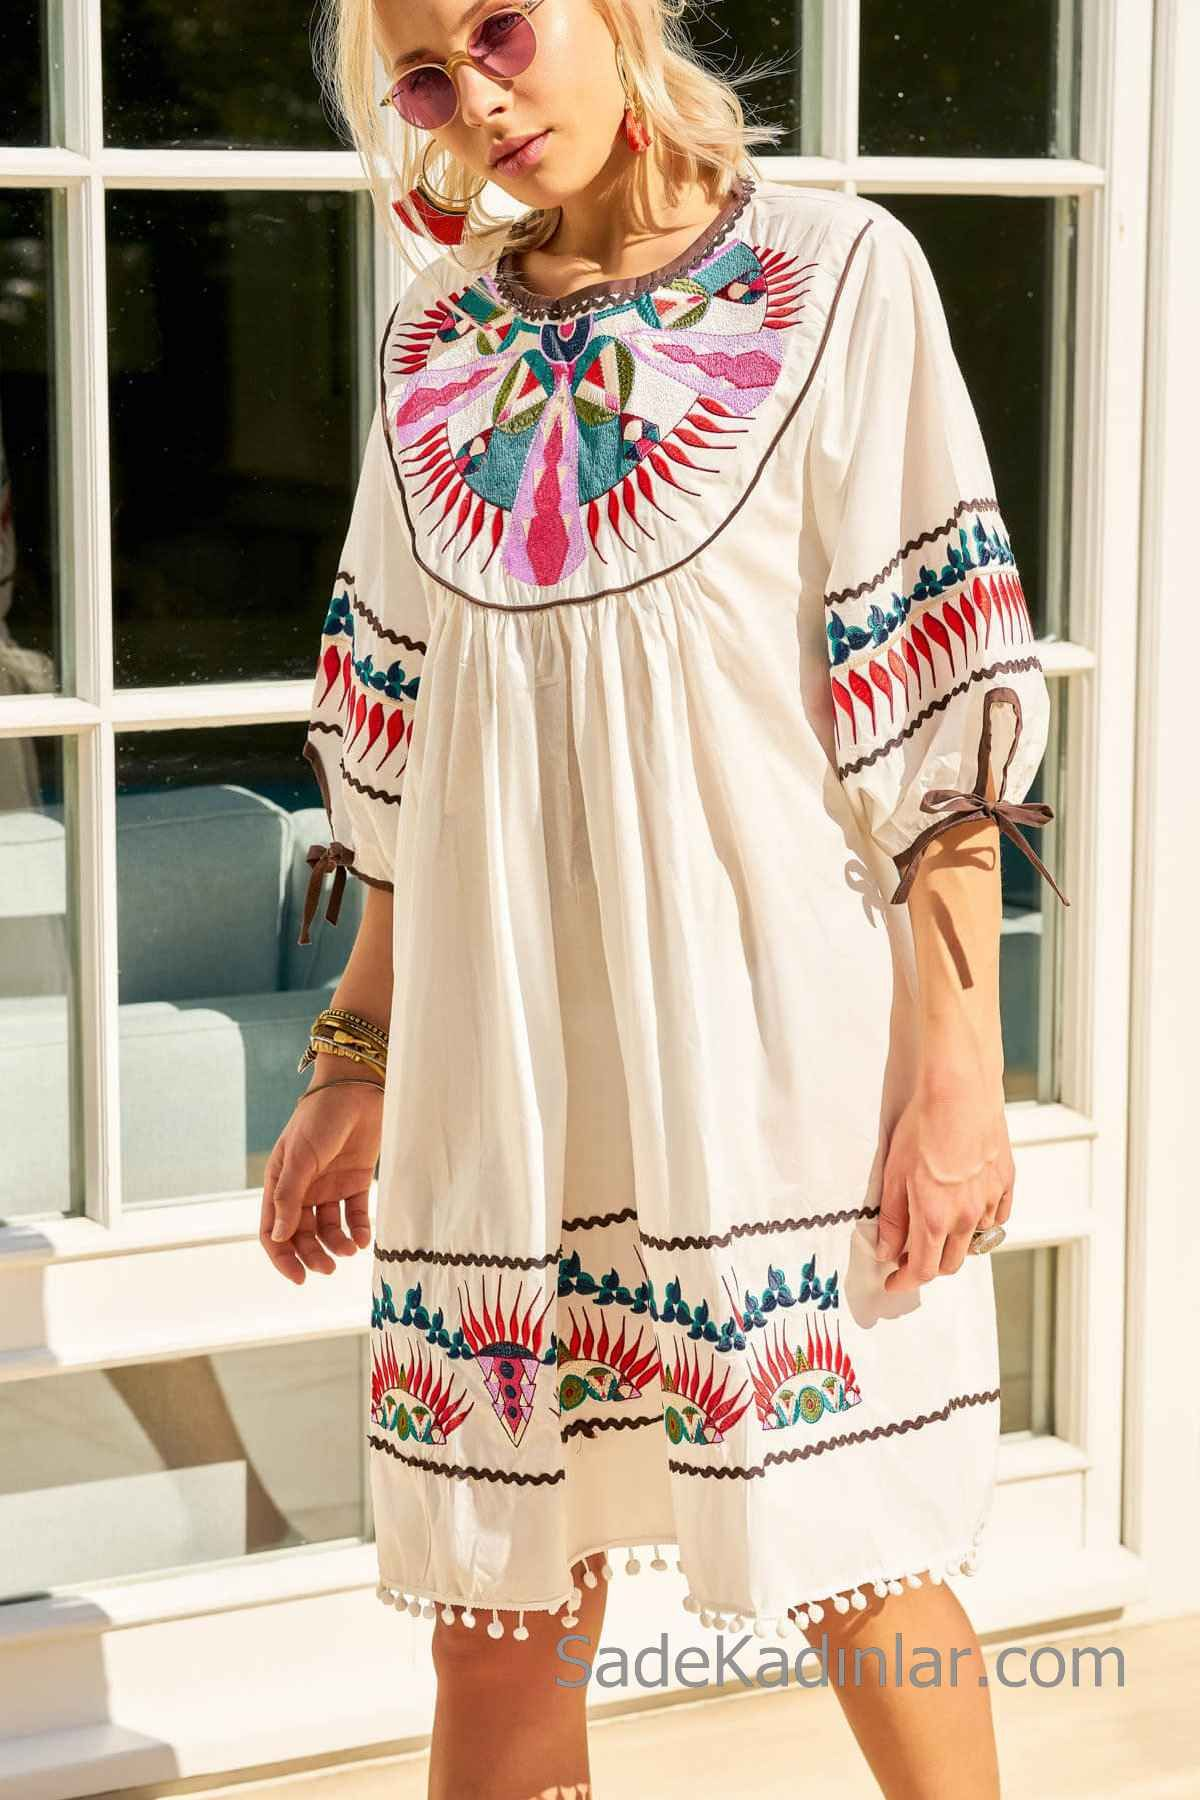 Bohem Elbise Modelleri Beyaz Kisa Genis Yaka Kisa Kol Nakis Islemeli Bohem Elbise Elbise Modelleri The Dress